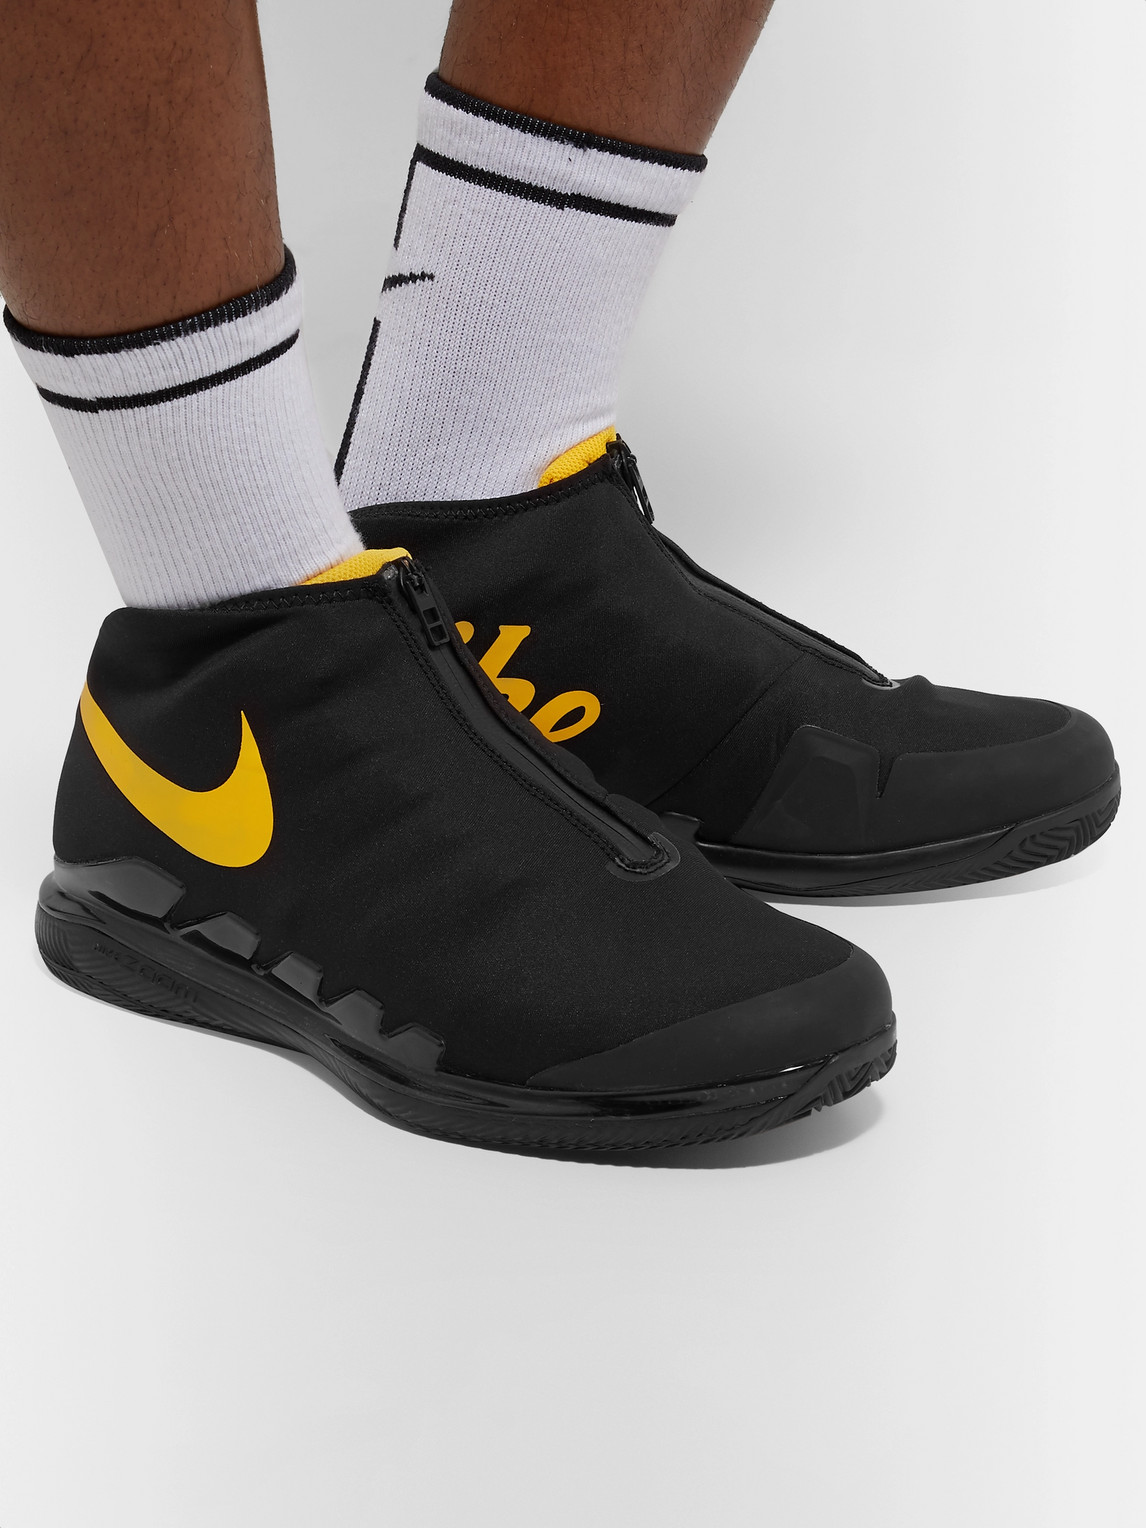 Nike Sneakers AIR ZOOM VAPOR X GLOVE NEOPRENE, RUBBER AND MESH TENNIS SNEAKERS